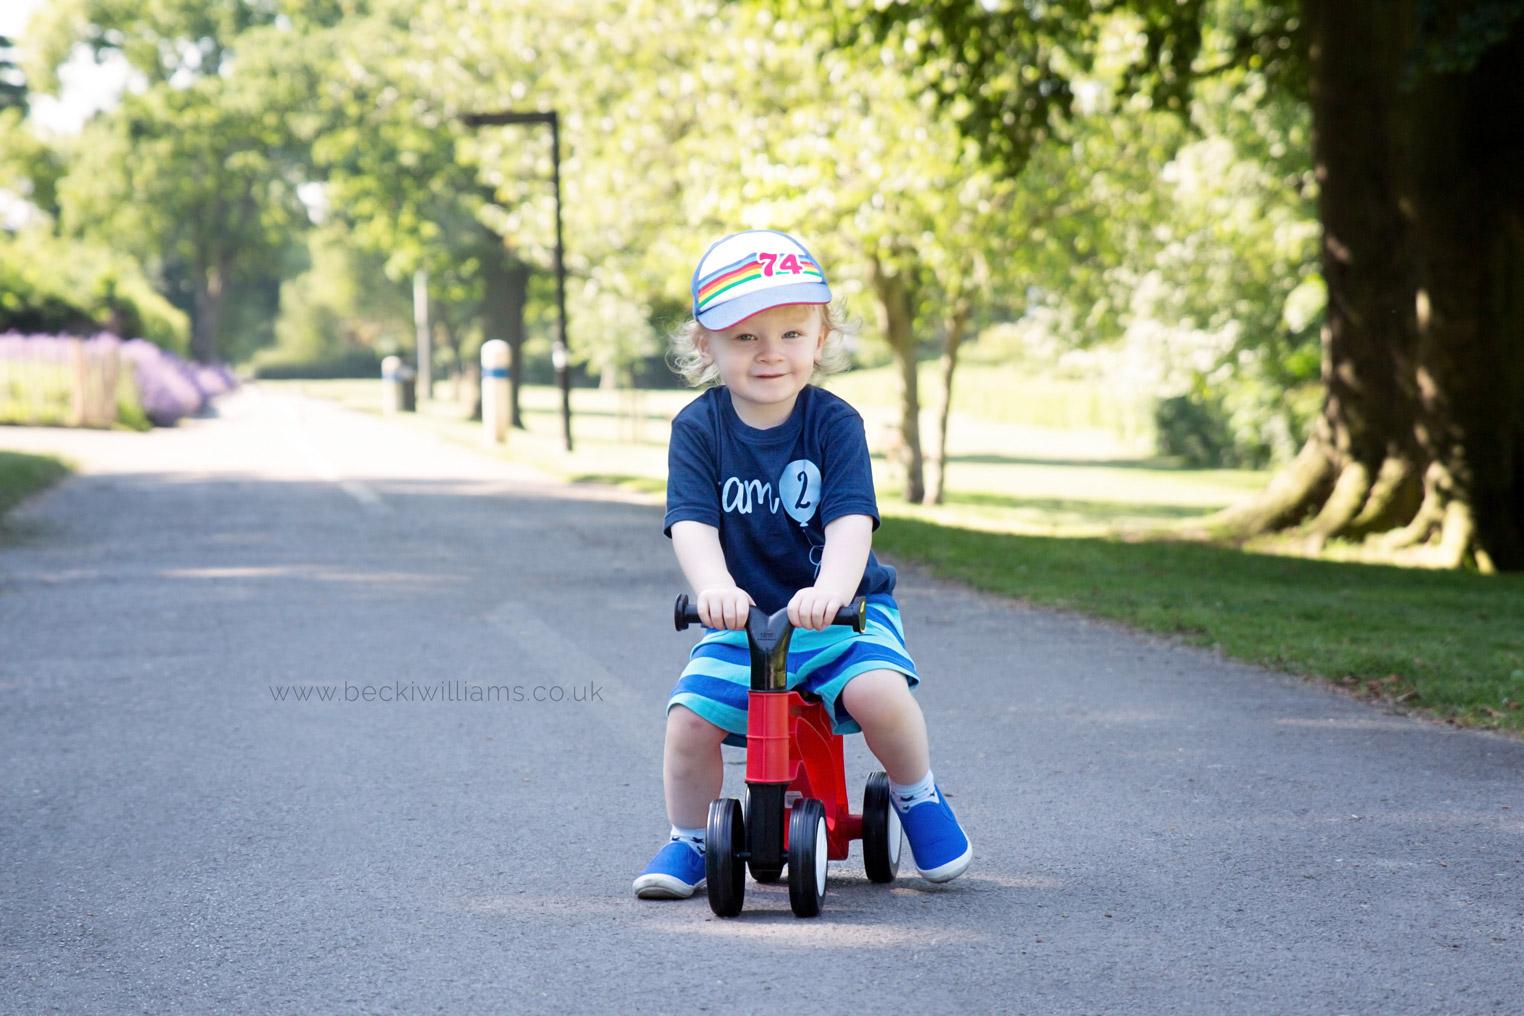 professional photography of 2 year old boy on his bike in gadebridge park, hemel hempstead